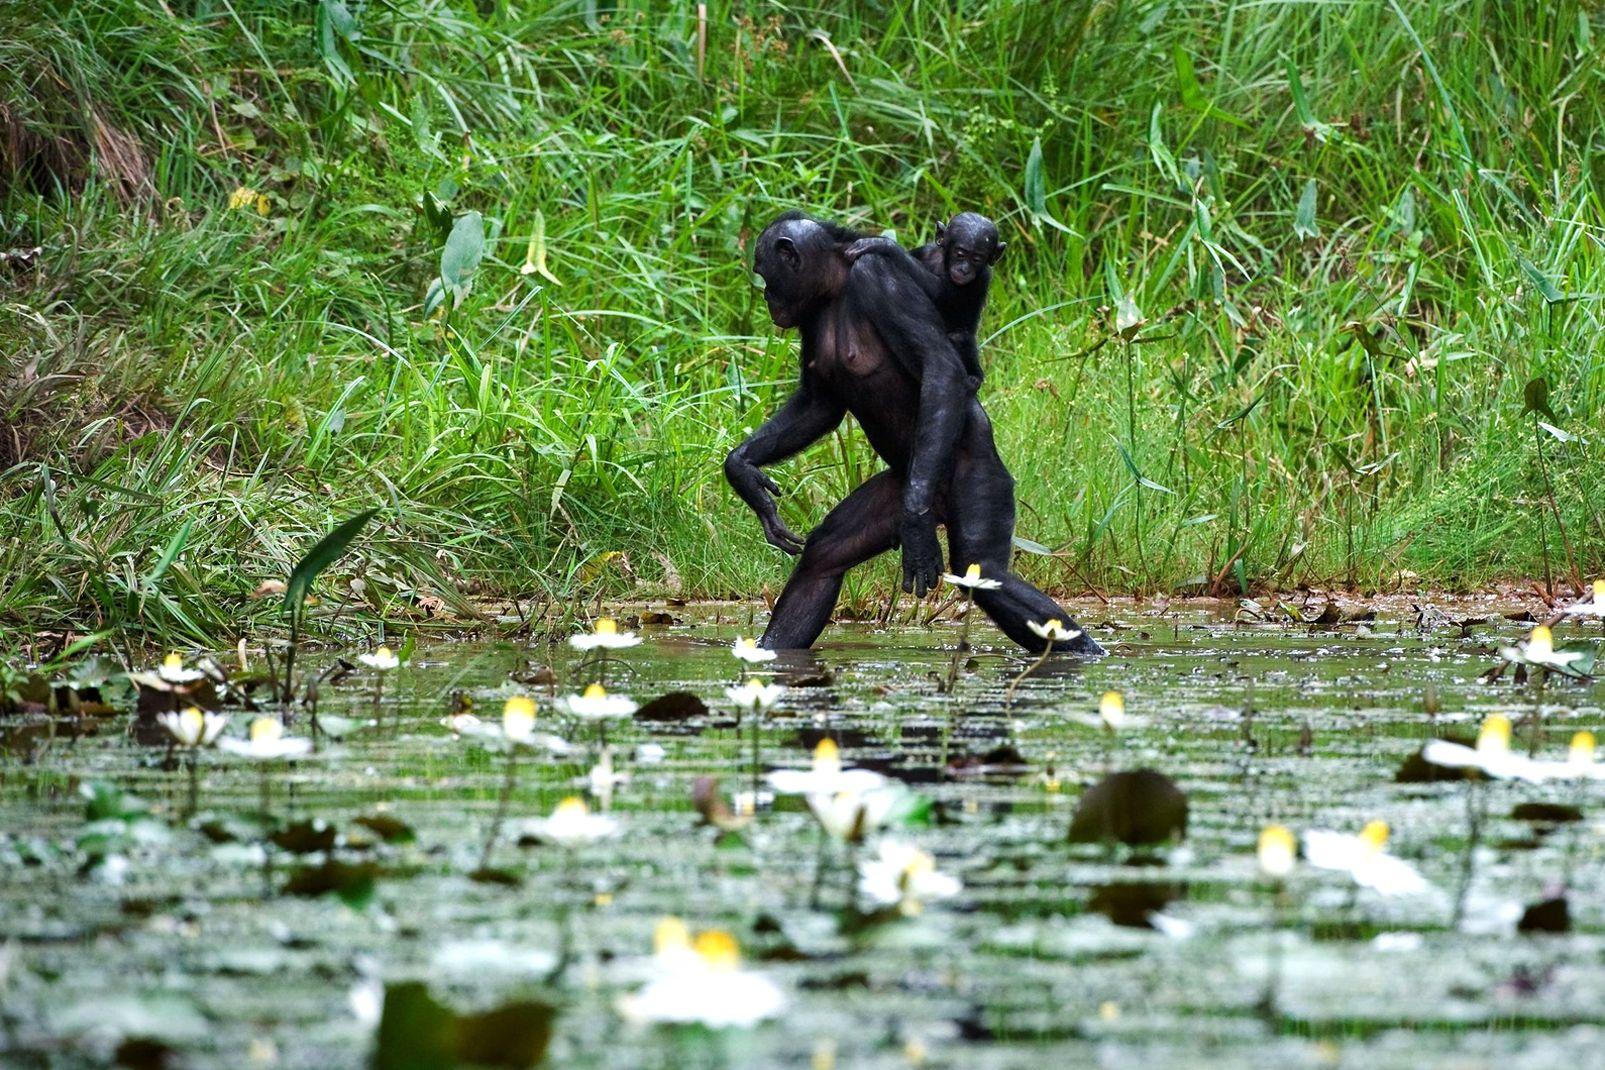 The Democratic Republic of Congo,